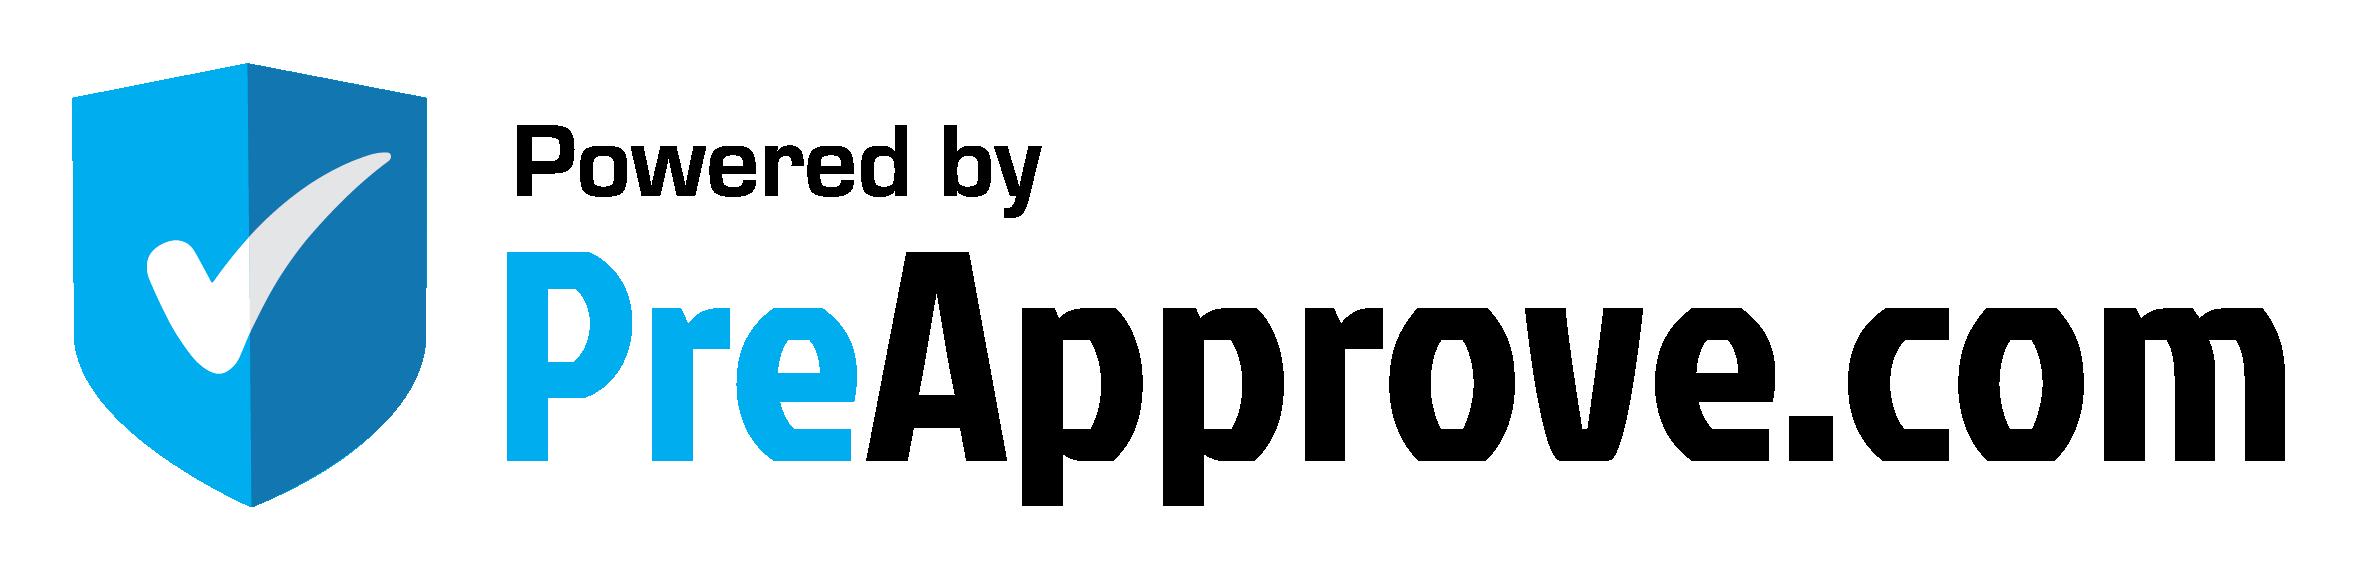 PreApproved.com Logo